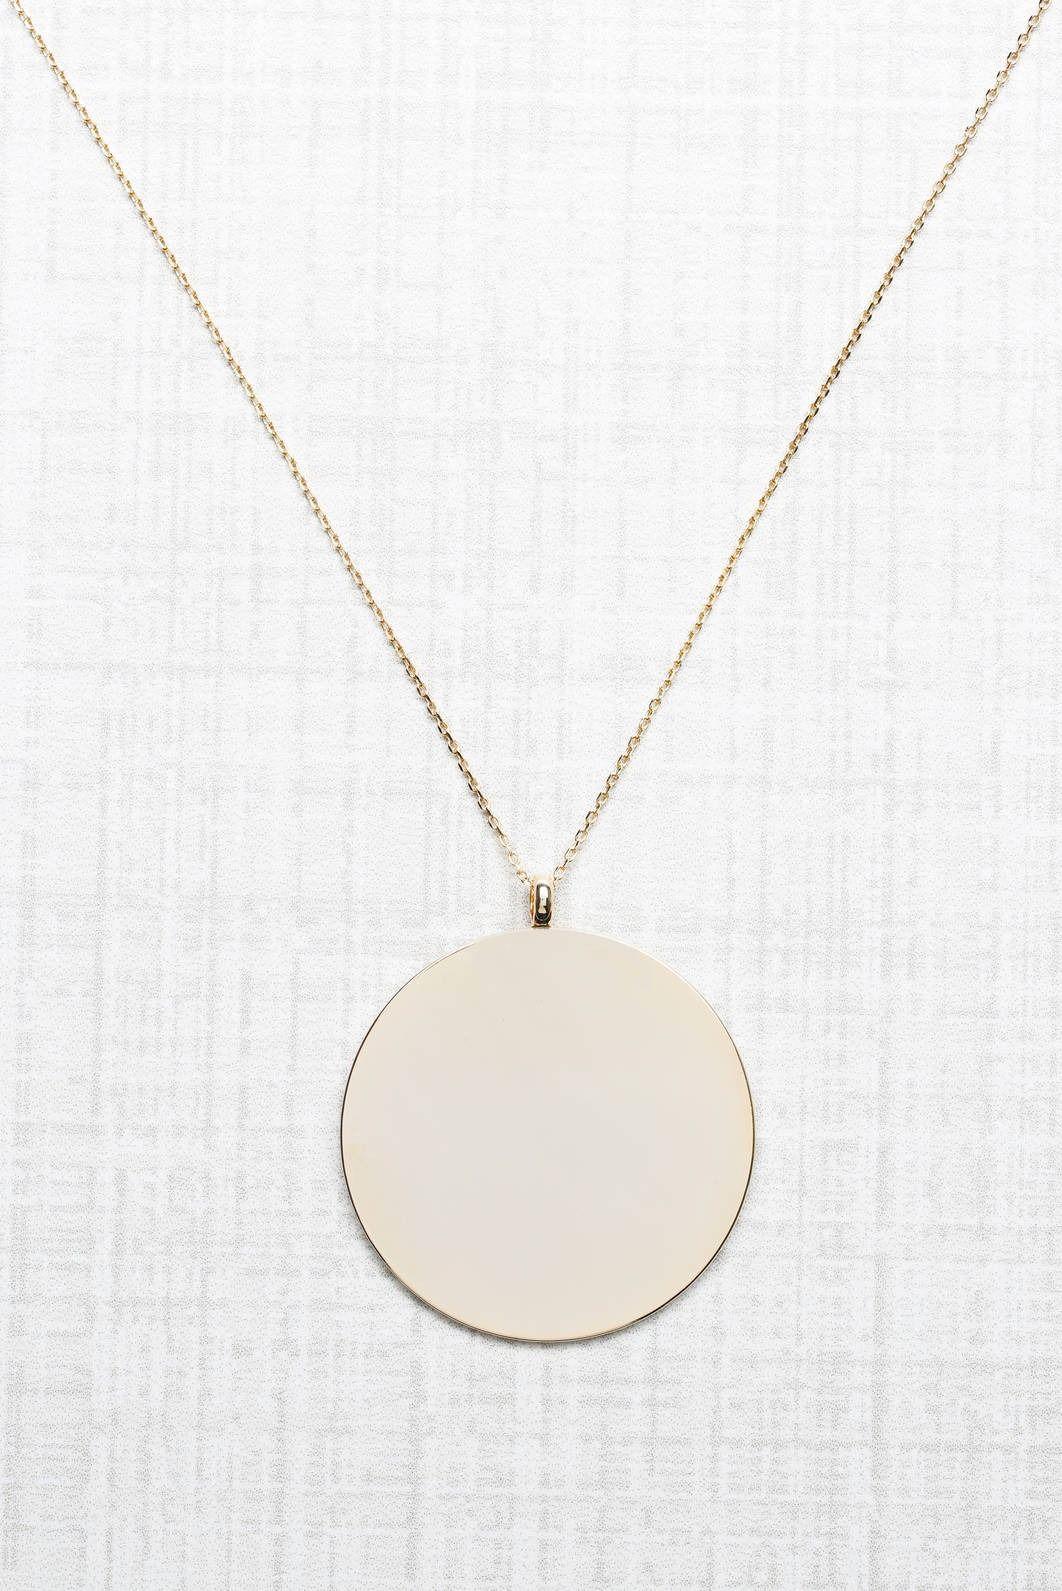 Bret Boho Clean Gold Disc Pendant Necklace   South Moon Under